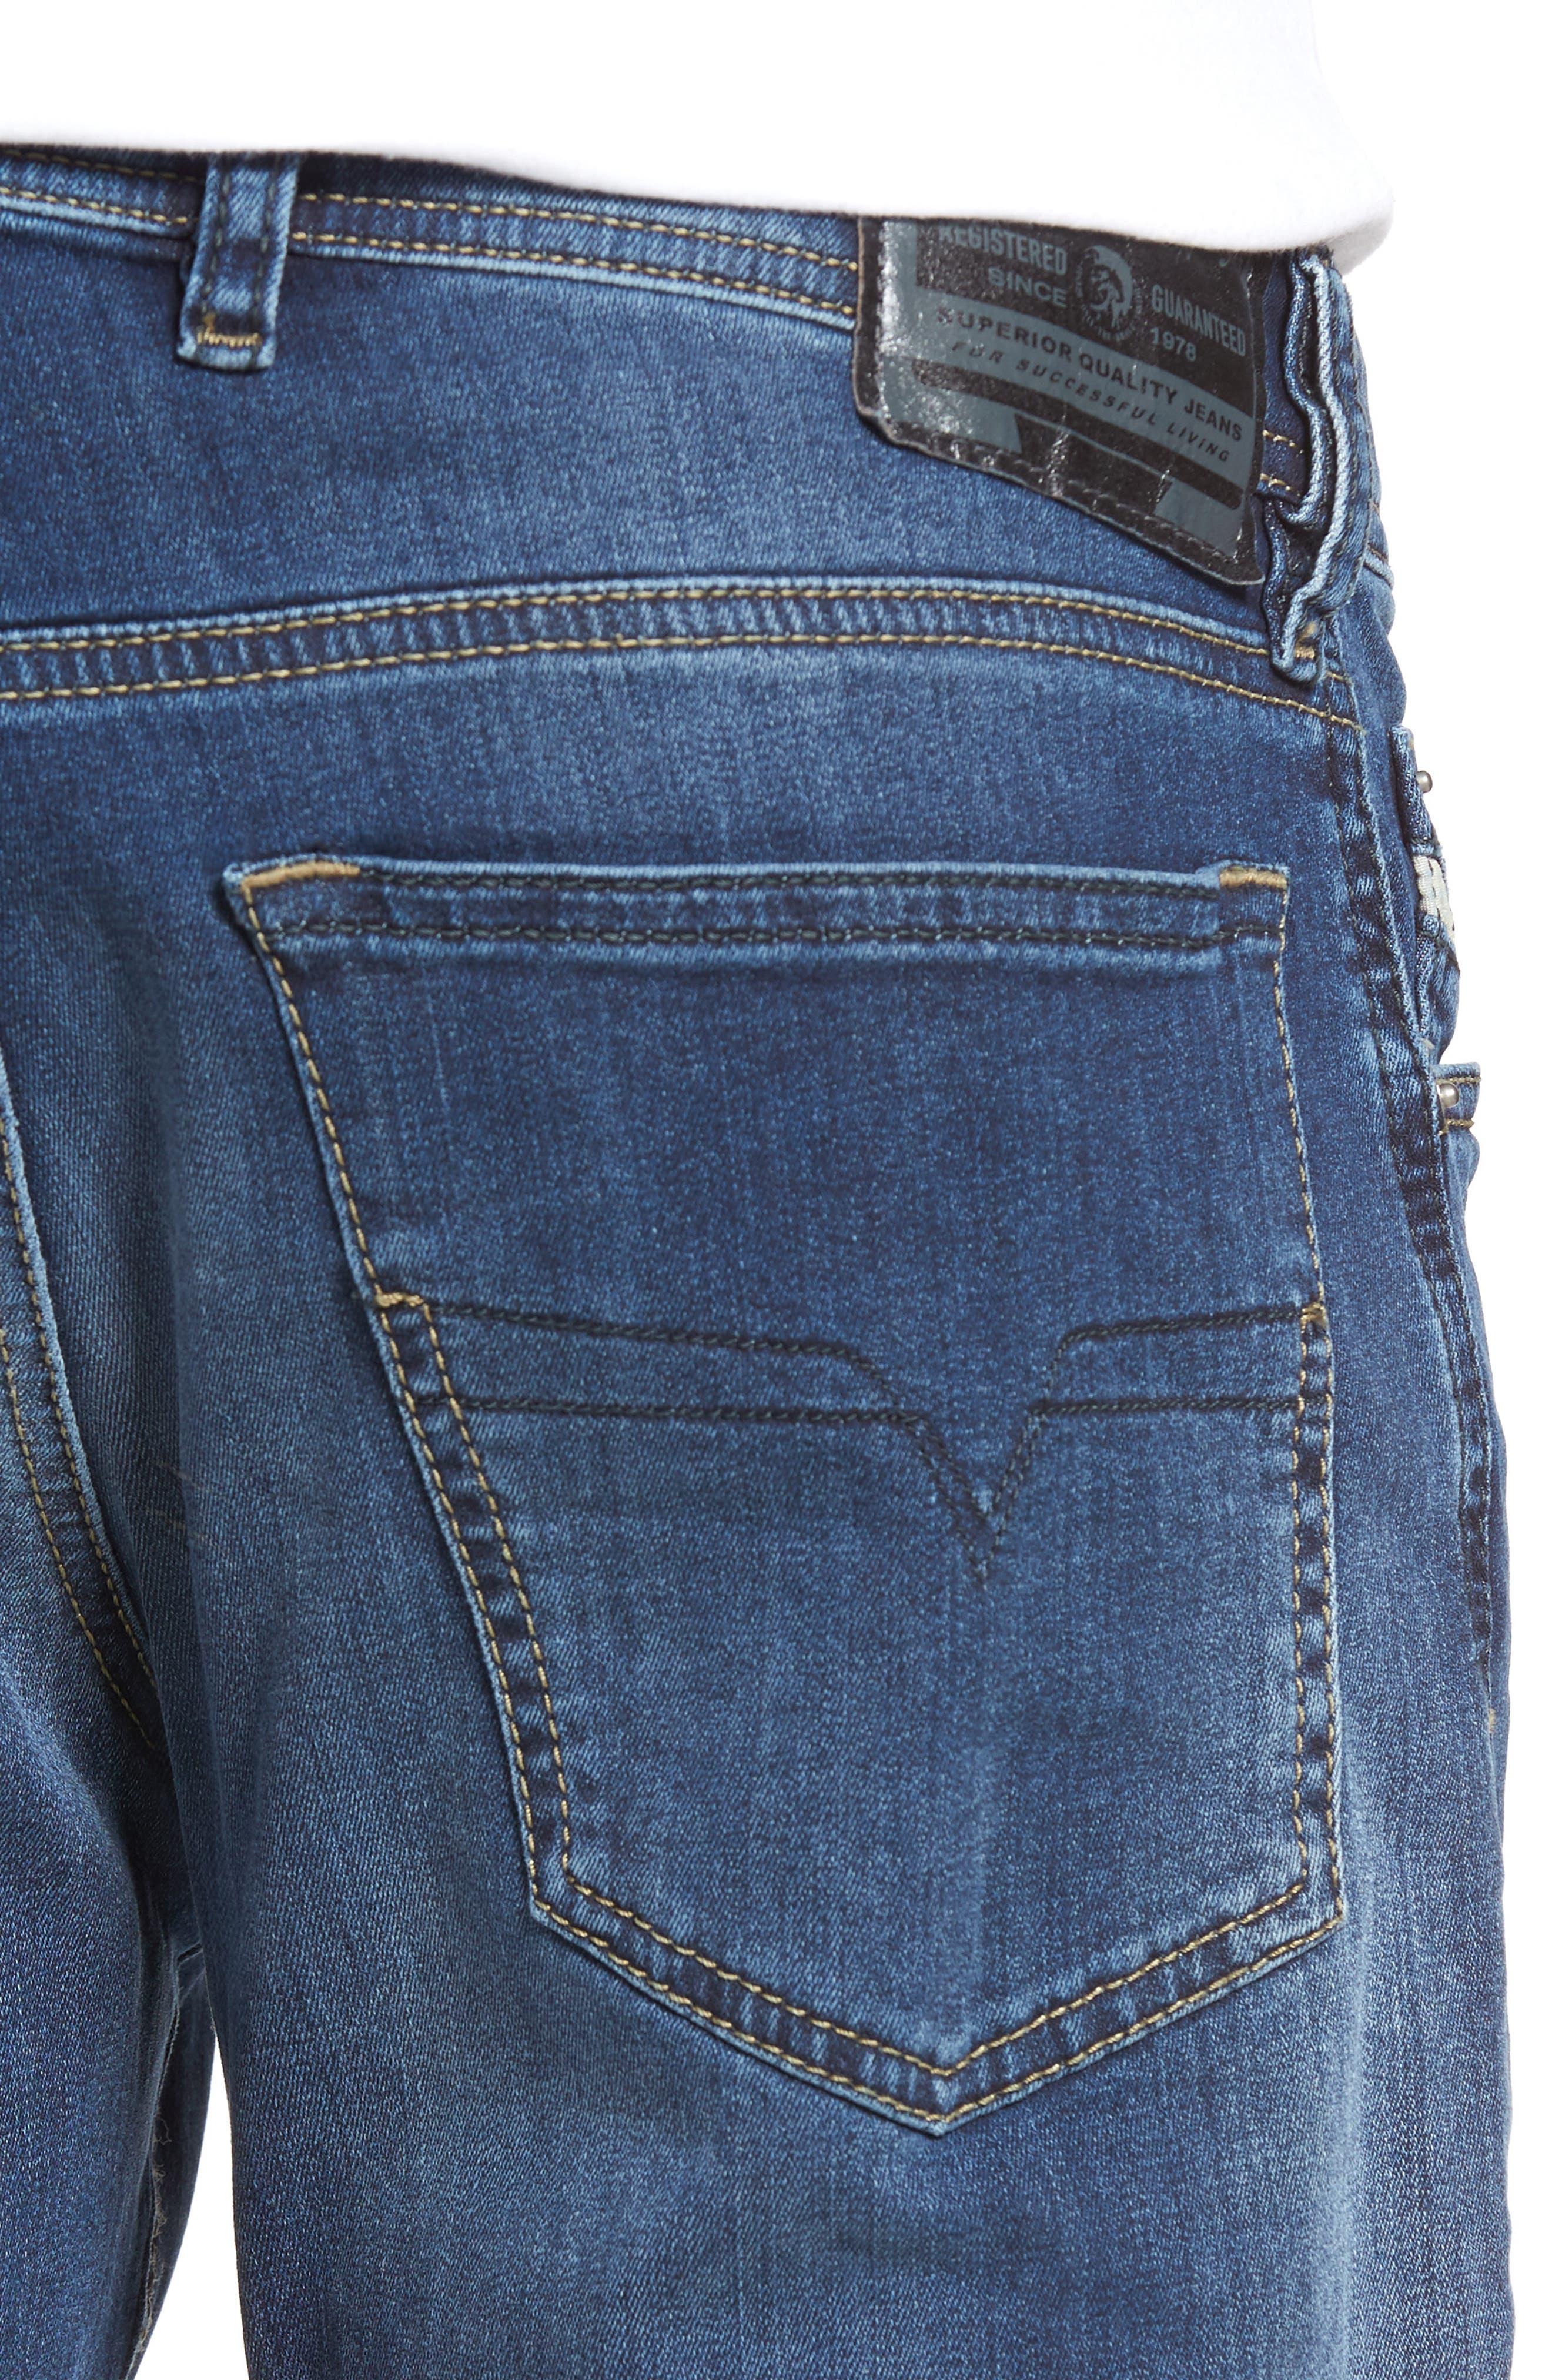 Waykee Straight Leg Jeans,                             Alternate thumbnail 4, color,                             0679I